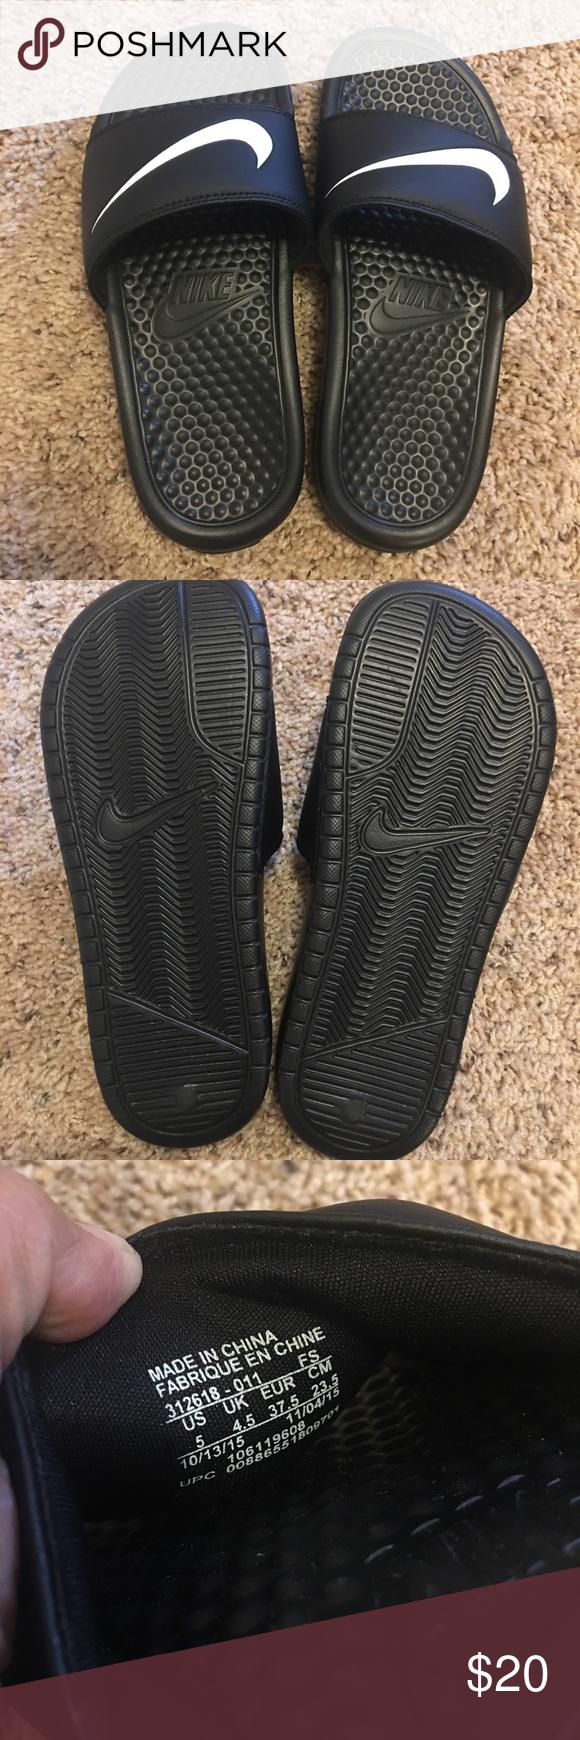 the latest 16e35 b5f9c Nike slippers Nwot nike slippers. Never worn. Size 5 men's ...